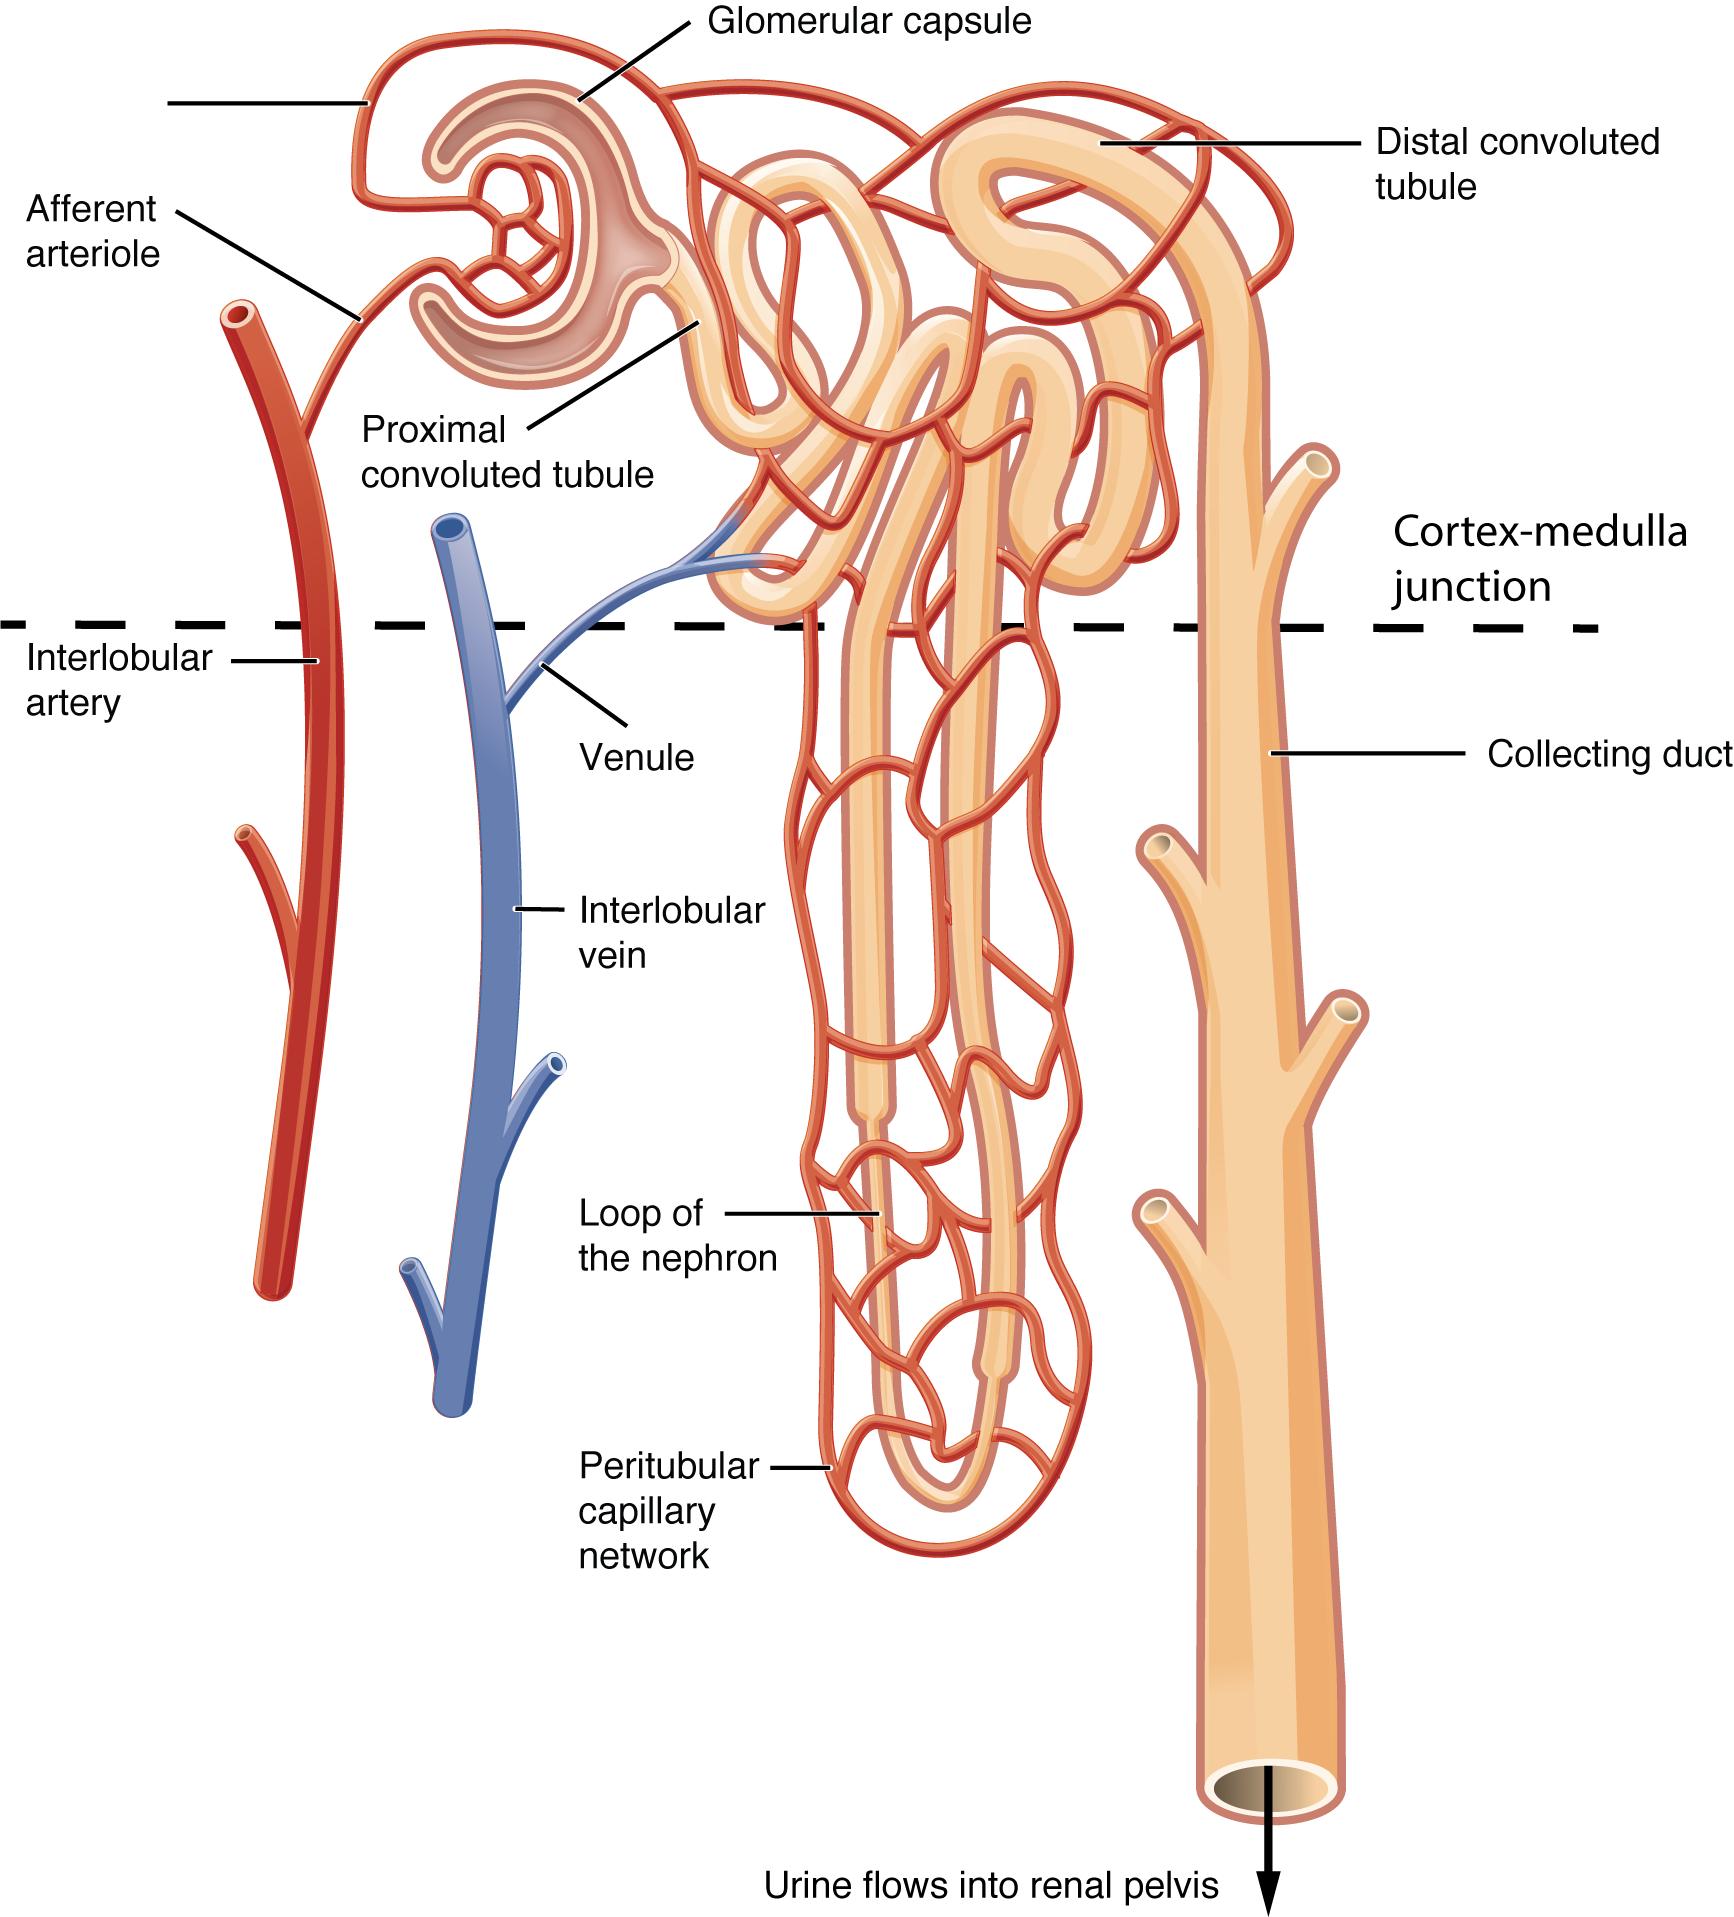 25.2 Microscopic Anatomy of the Kidney: Anatomy of the Nephron – Anatomy &  PhysiologyOregon State University, Open Educational Resources Unit